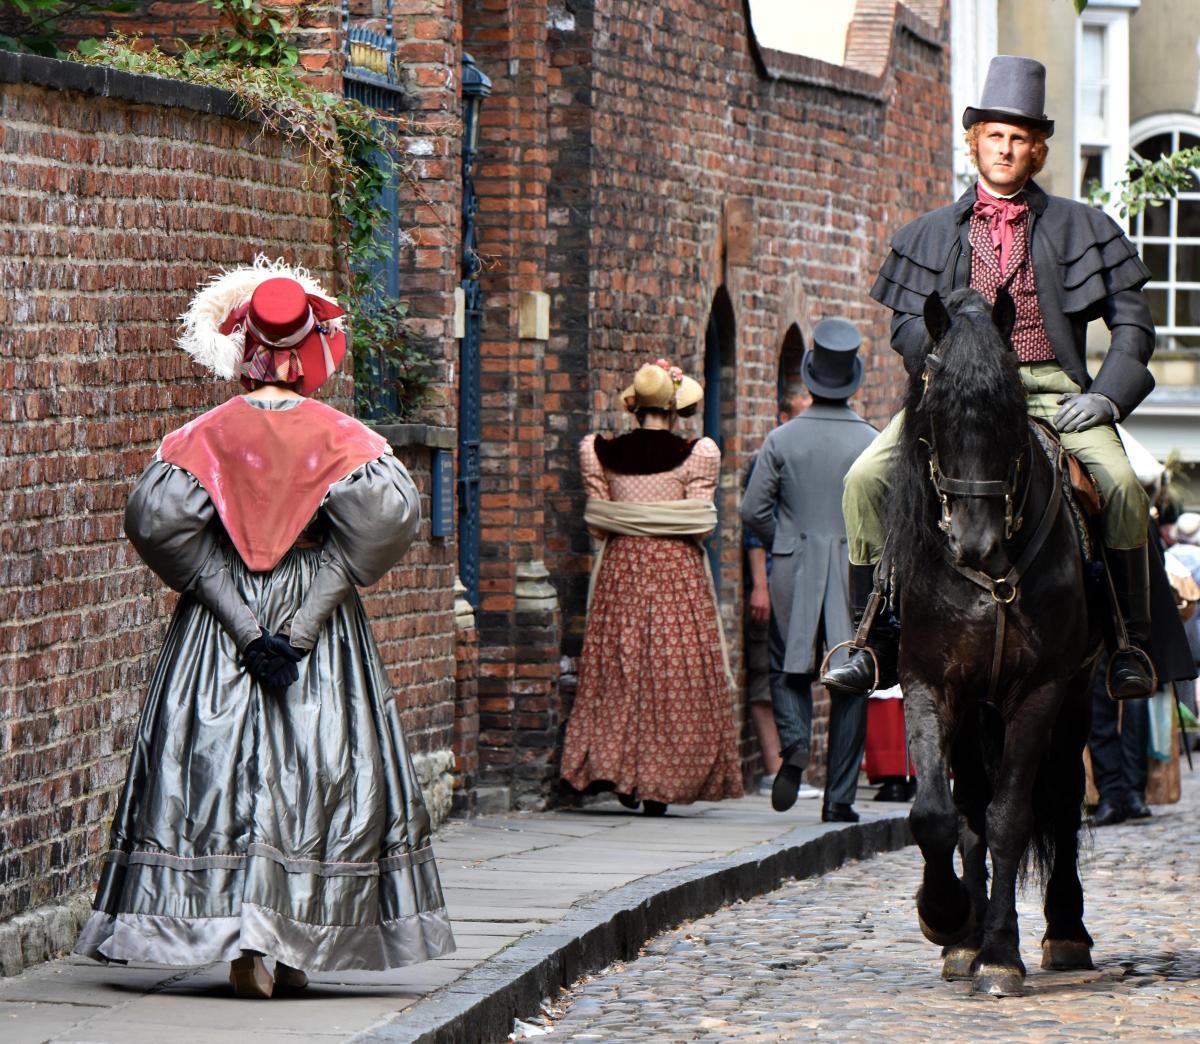 York filming for BBC TV drama, Gentleman Jack | York Press